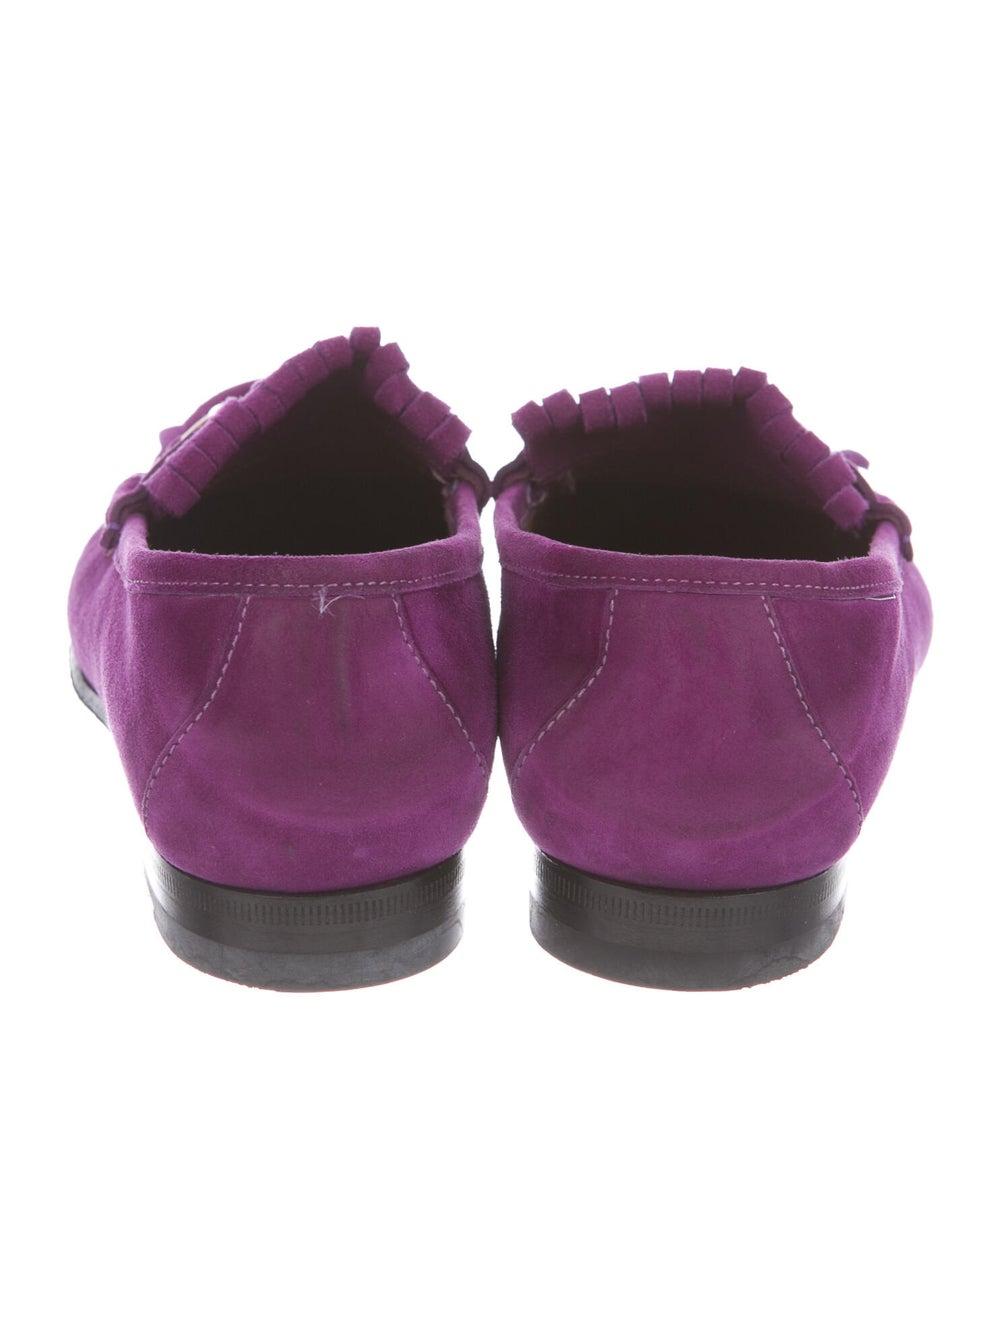 Gucci Horsebit Accent Suede Loafers Purple - image 4